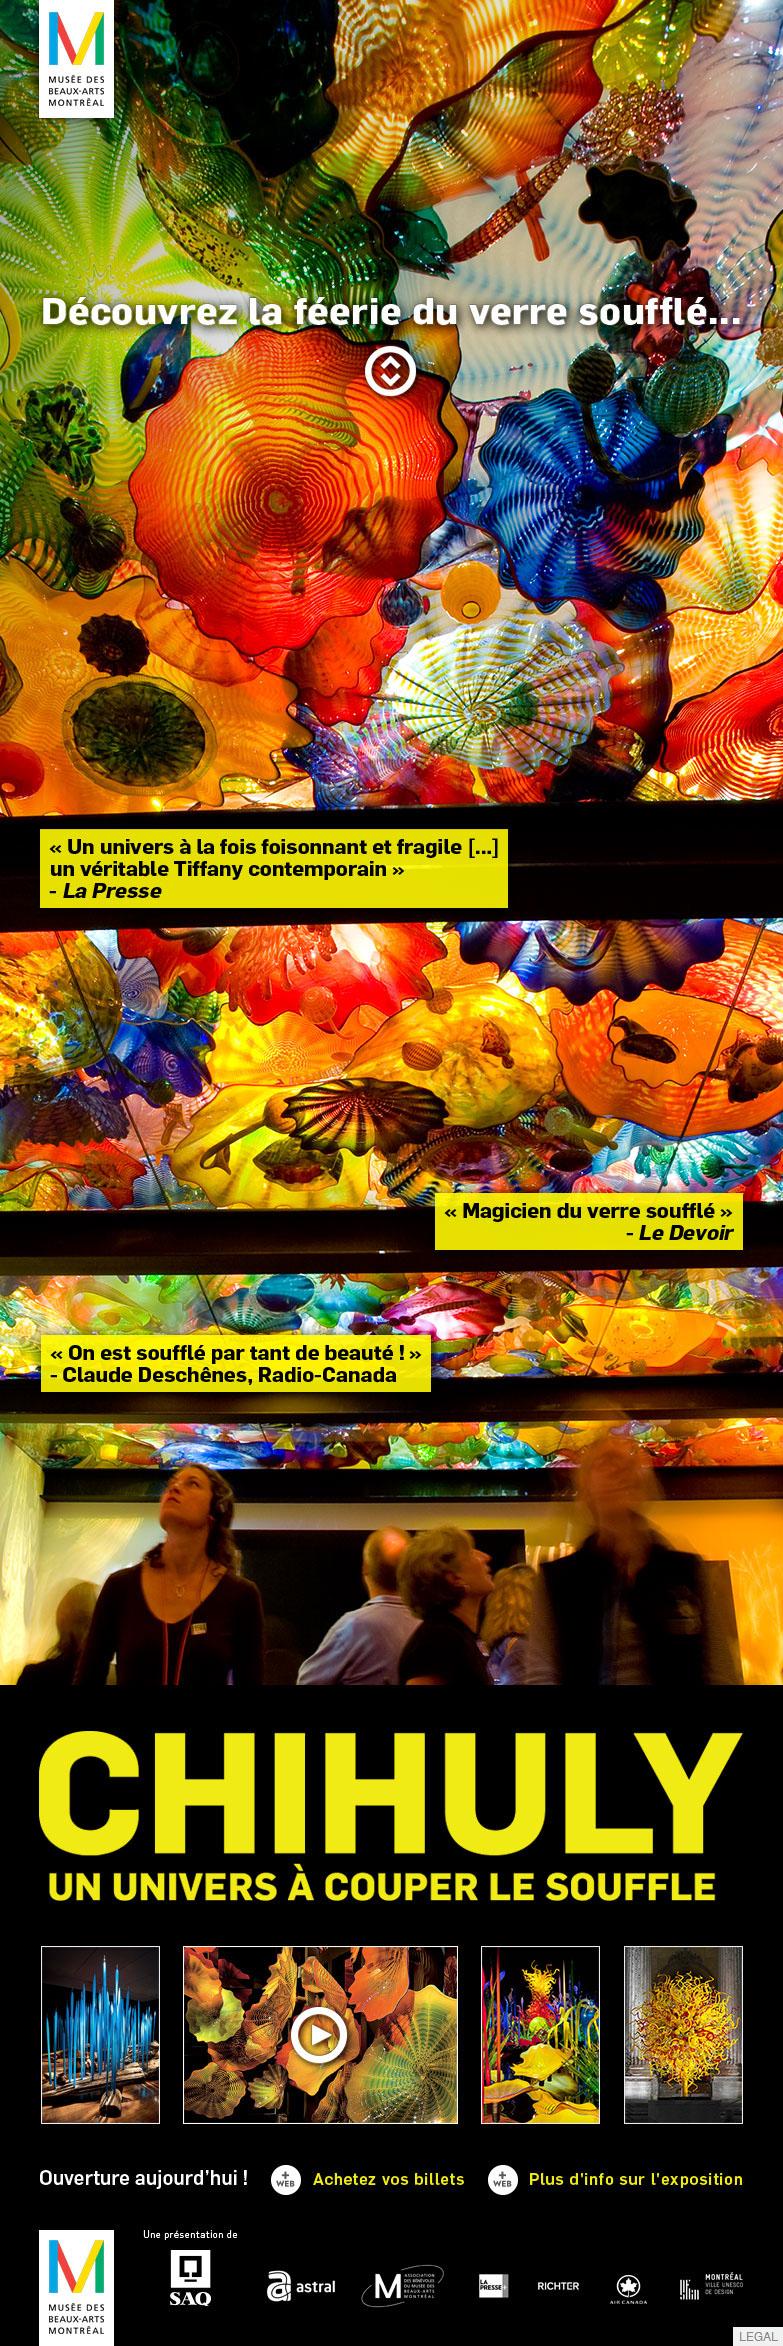 mbam MMFA Musée des Beaux-Arts Montreal Quebec art contemporary art Art Contemporain beaux-arts Splendore A Venezia peter doig No Foreign Lands chihuly peru ux/ui